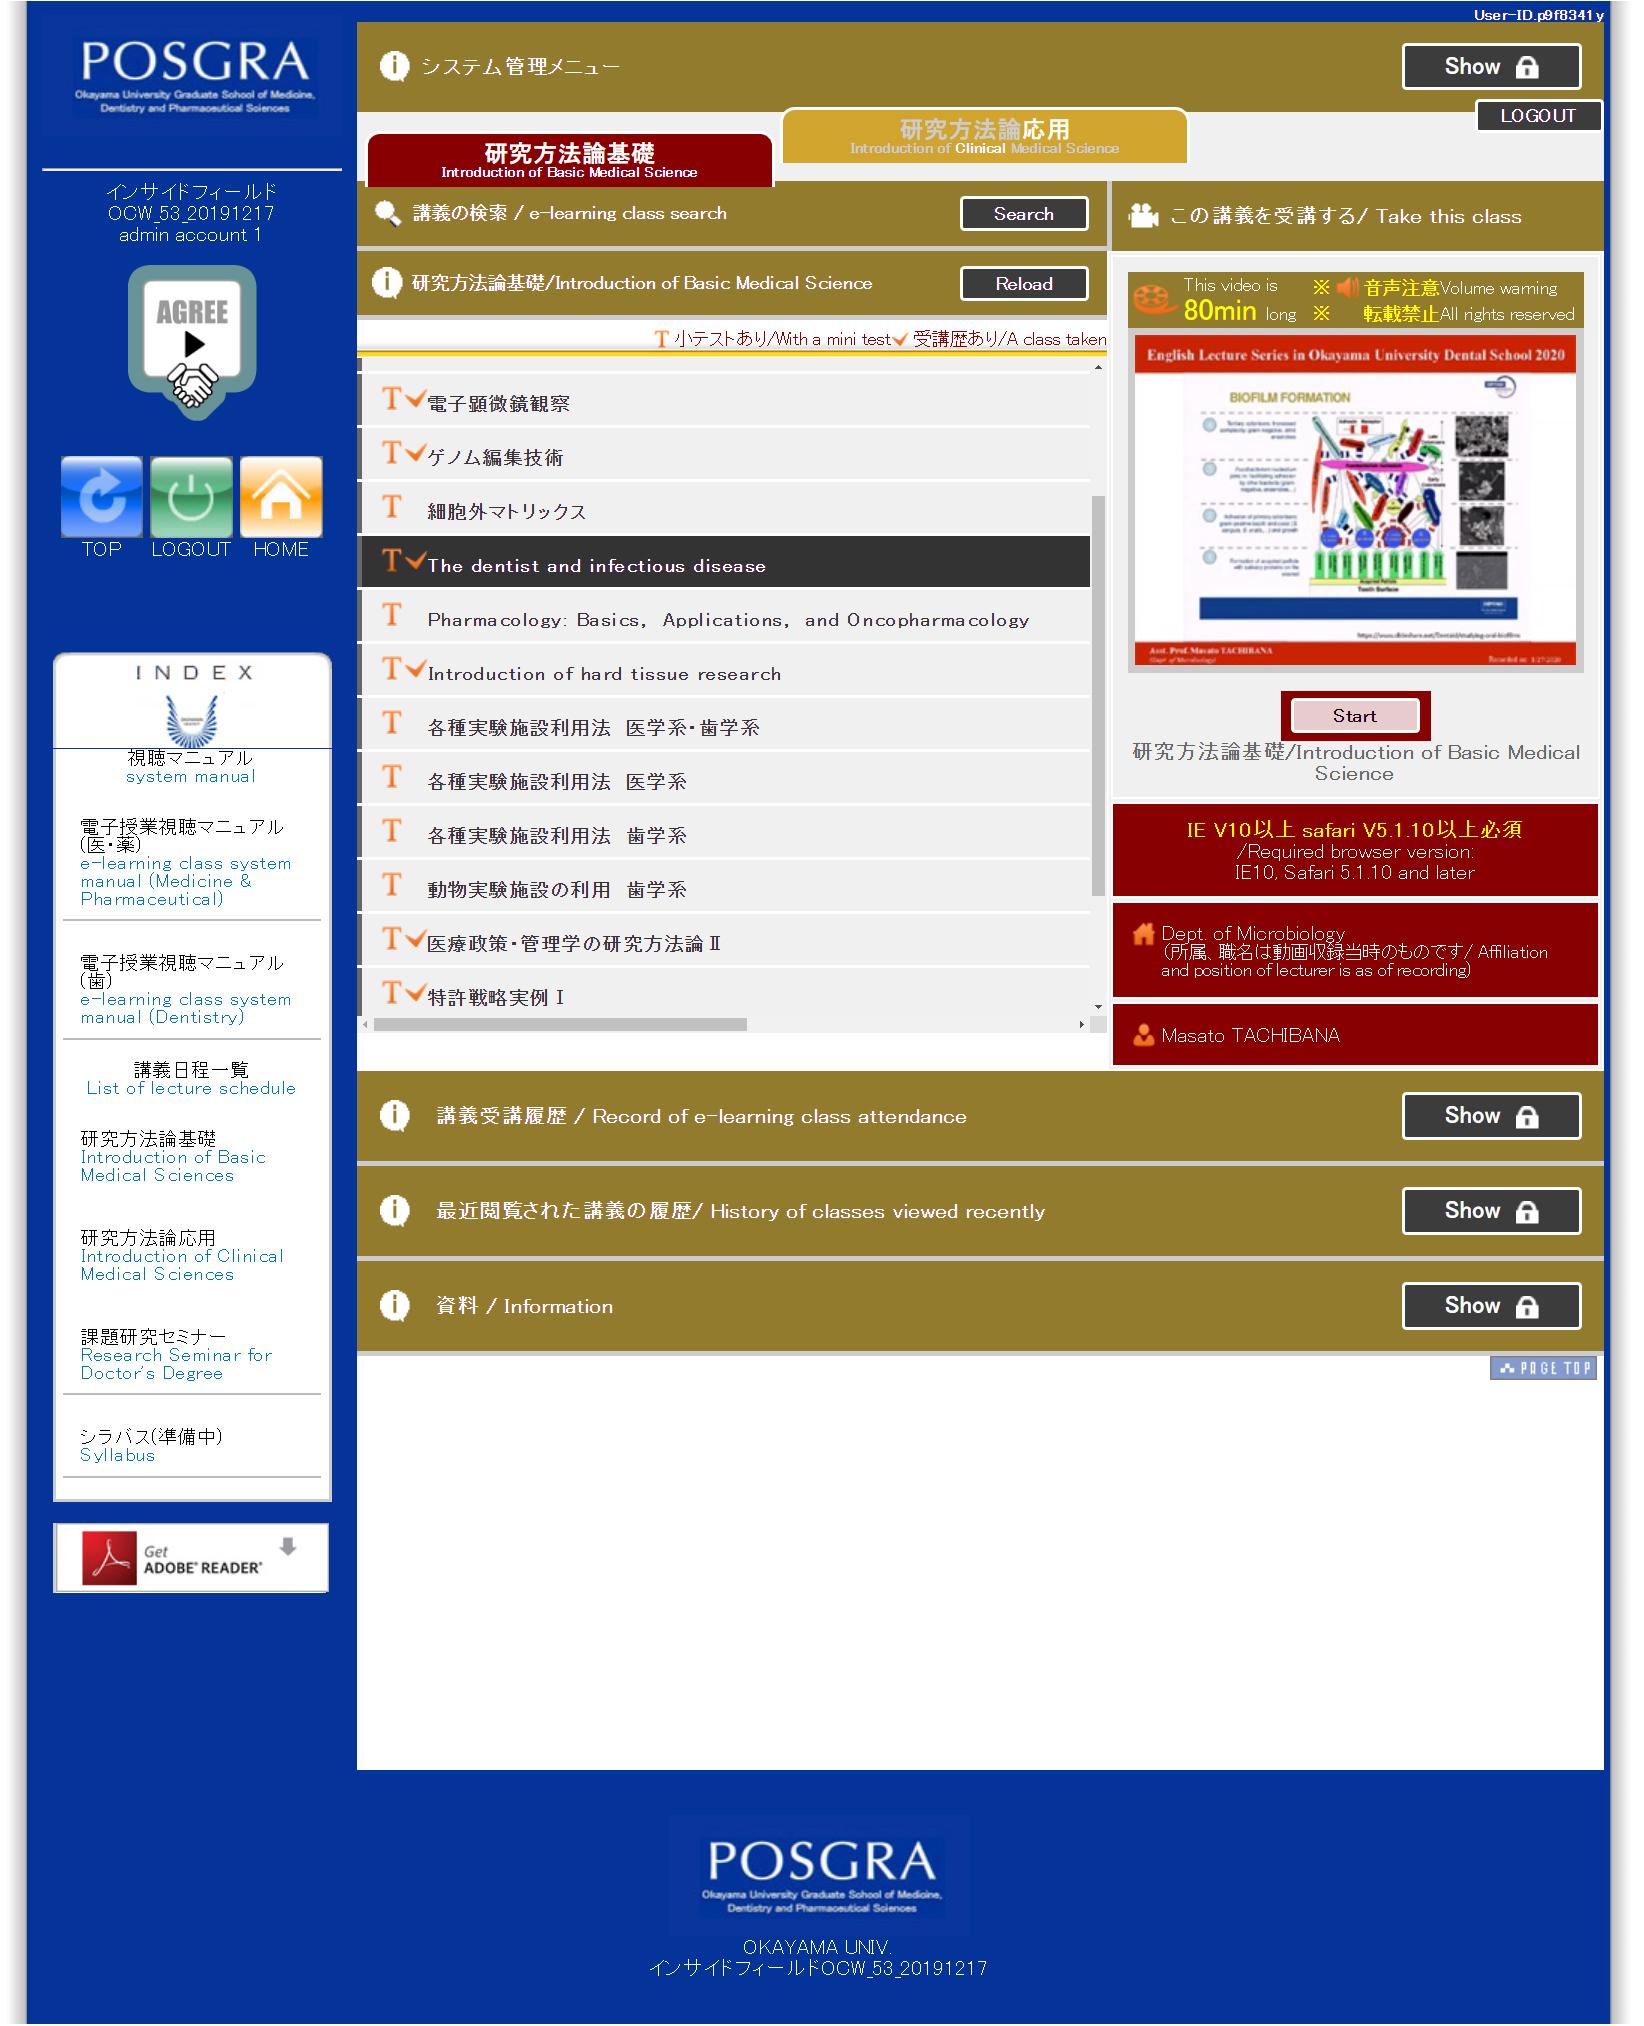 Web クラス 大学 就実 webclass就実, 就実大学・就実短期大学»